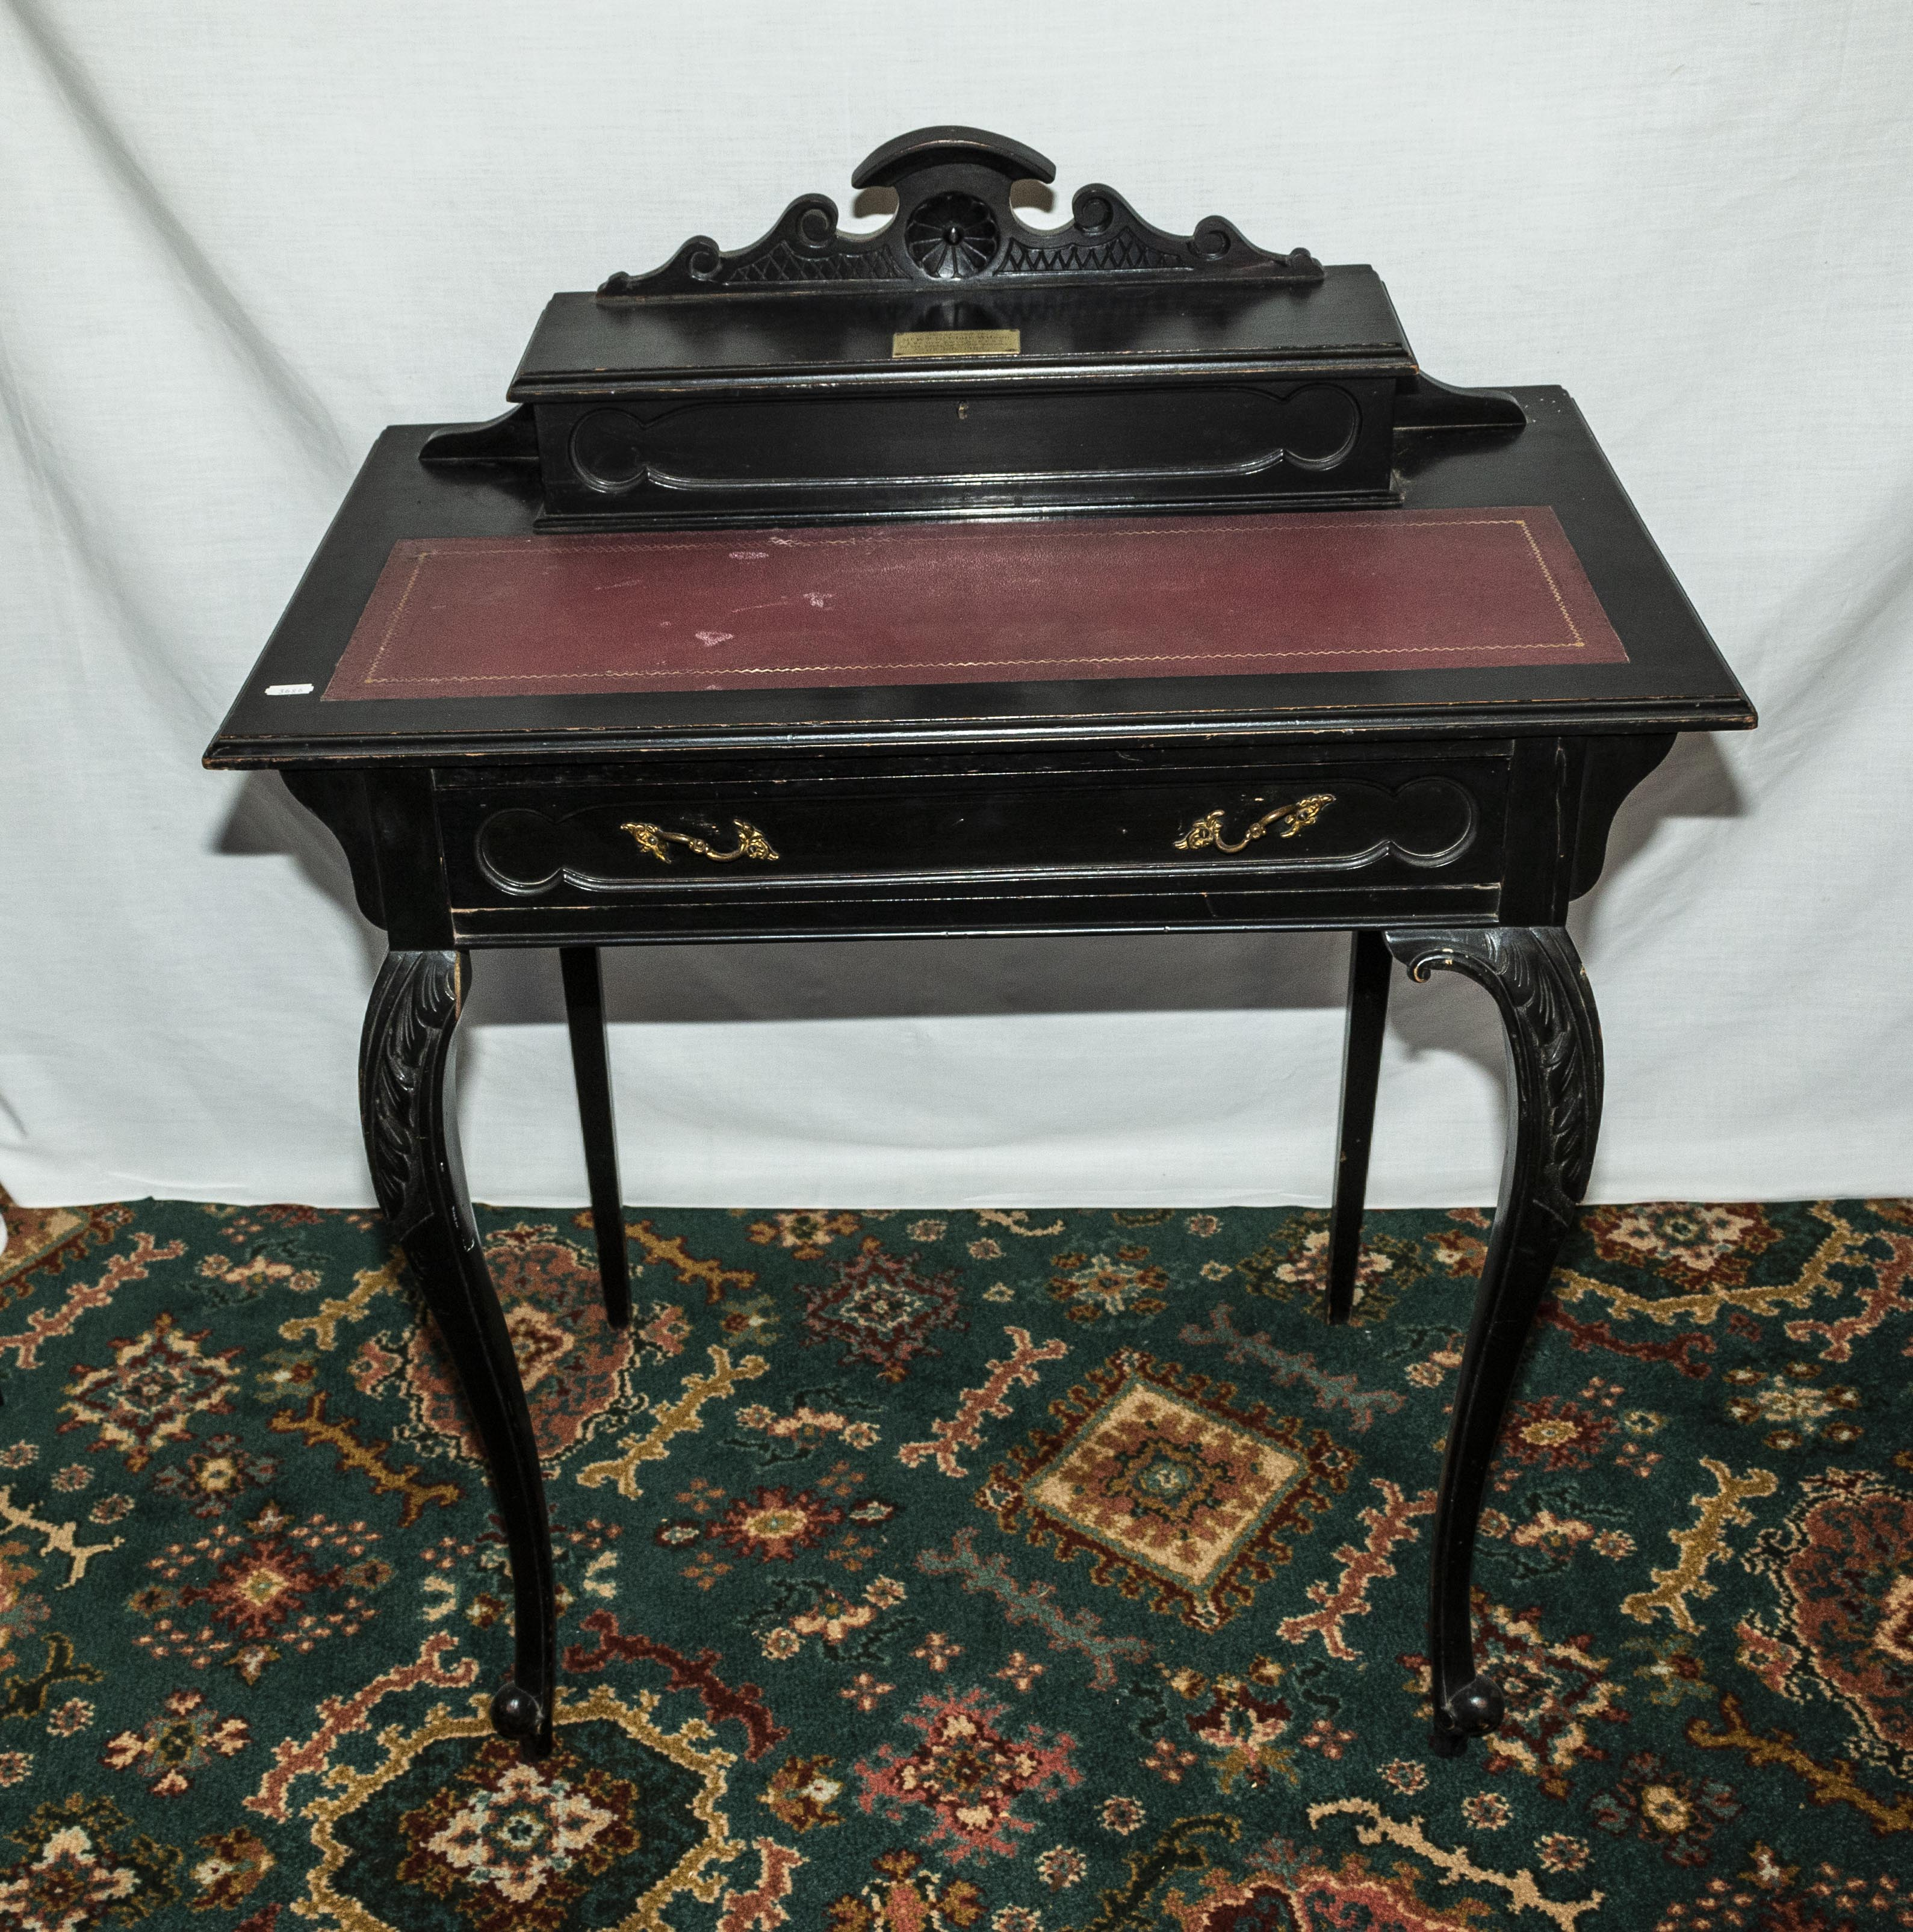 Lot 38 - An Edwardian lady's desk.